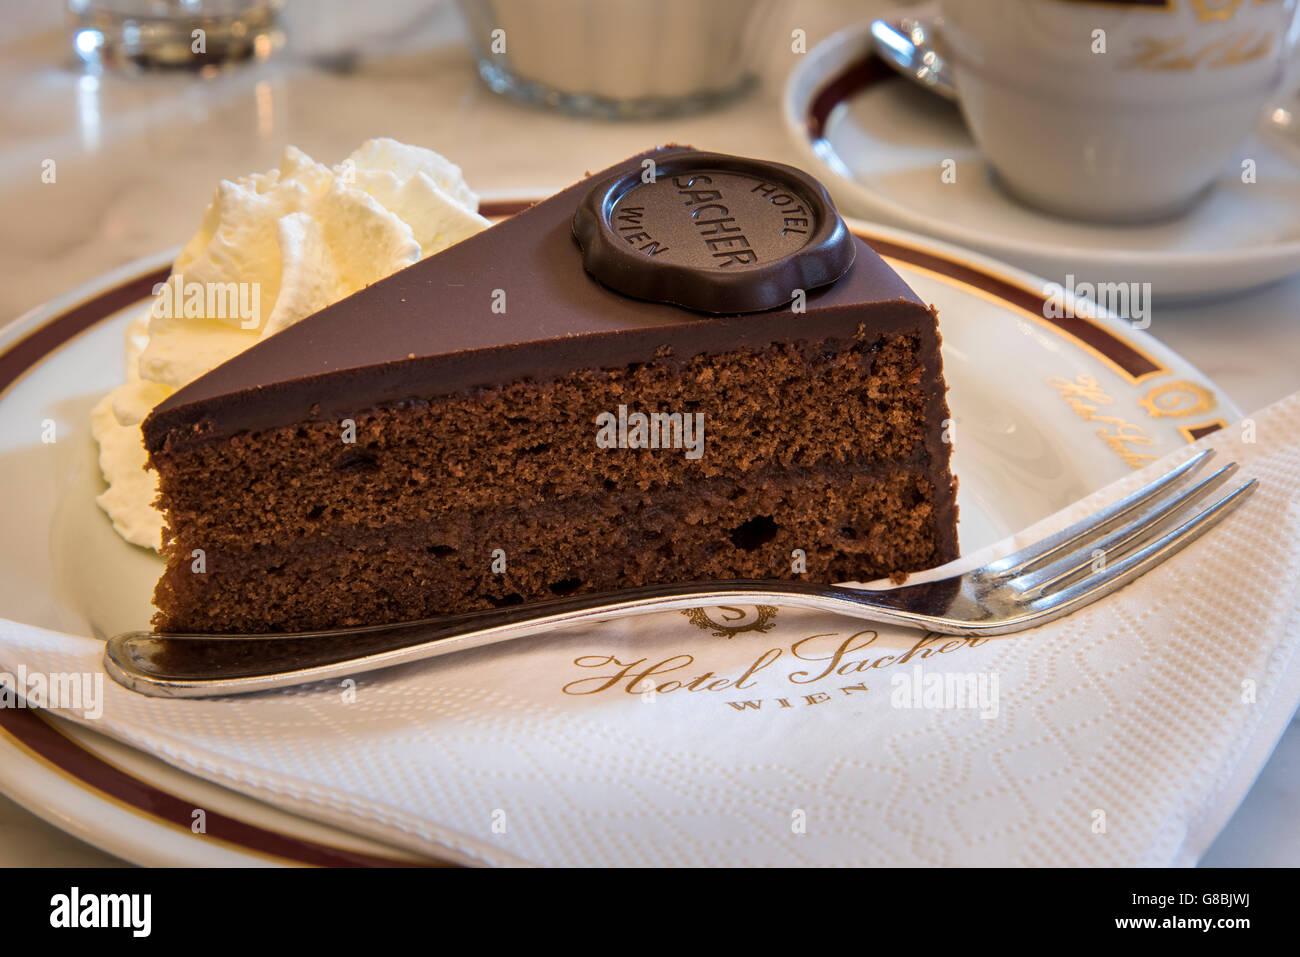 Chocolate Origin Cake